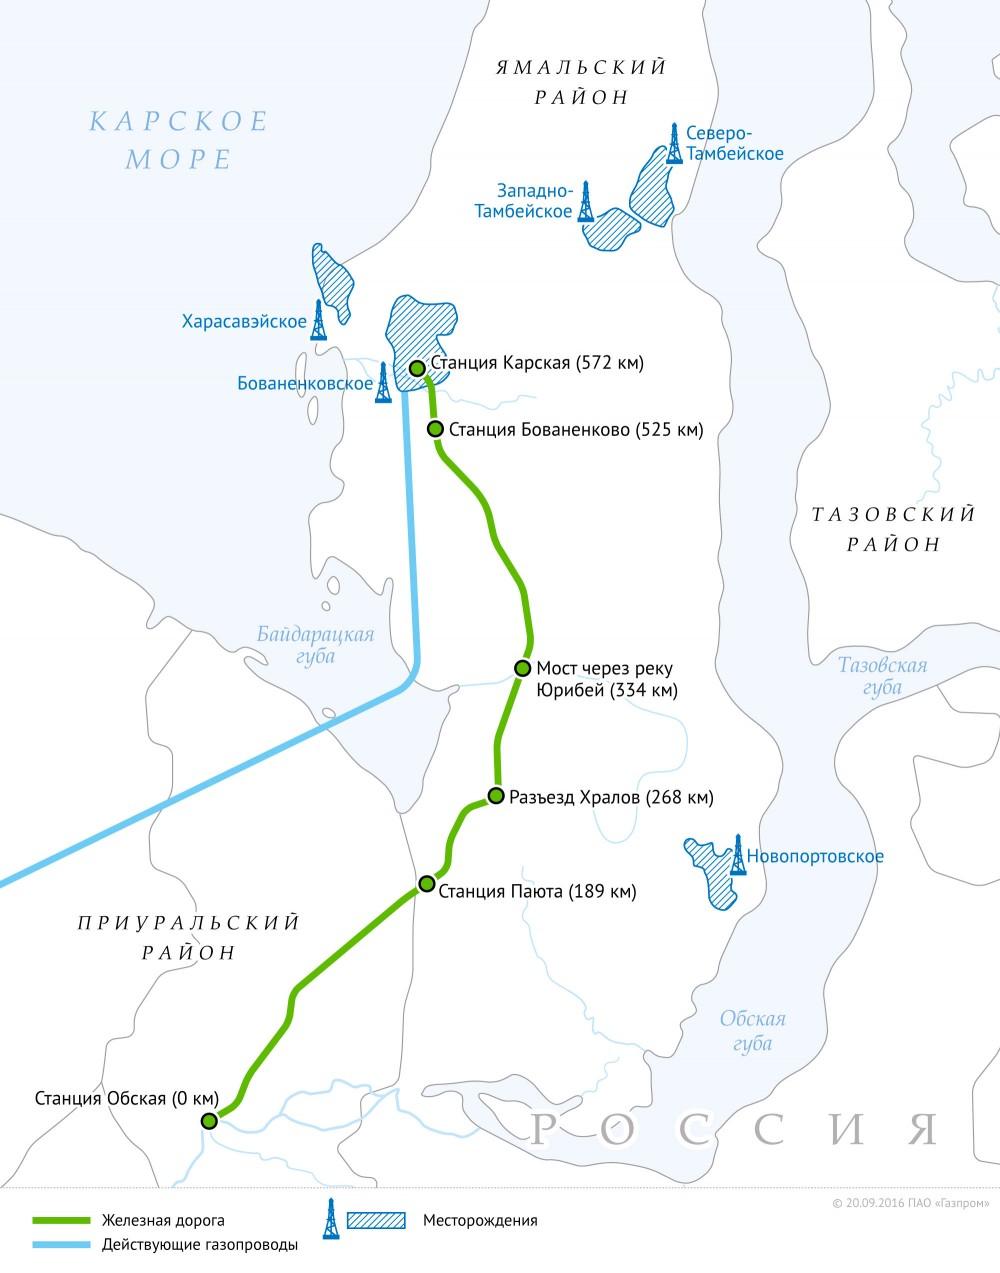 yamalrailway-gazprom_1-1000x1273